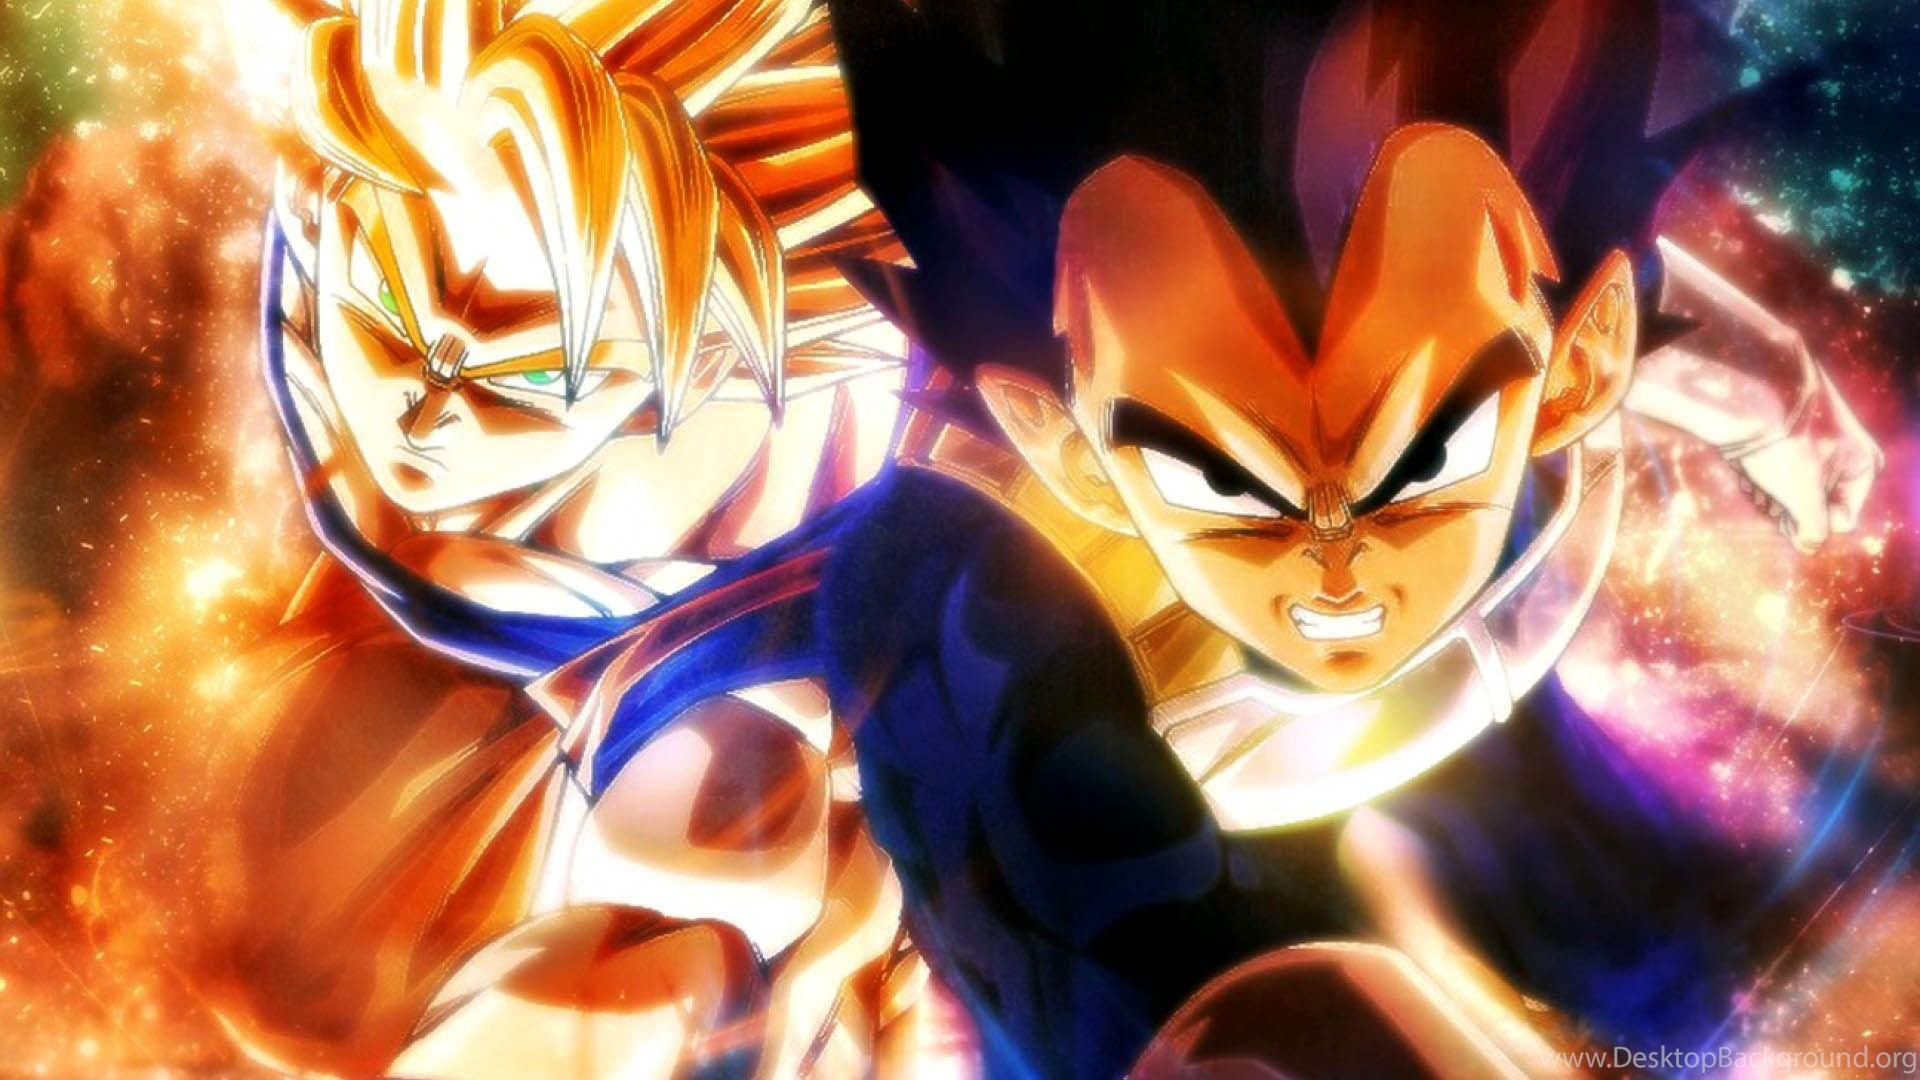 Dragon Ball Goku Vegeta 1920x1080 Full Hd 16 9 Wallpapers